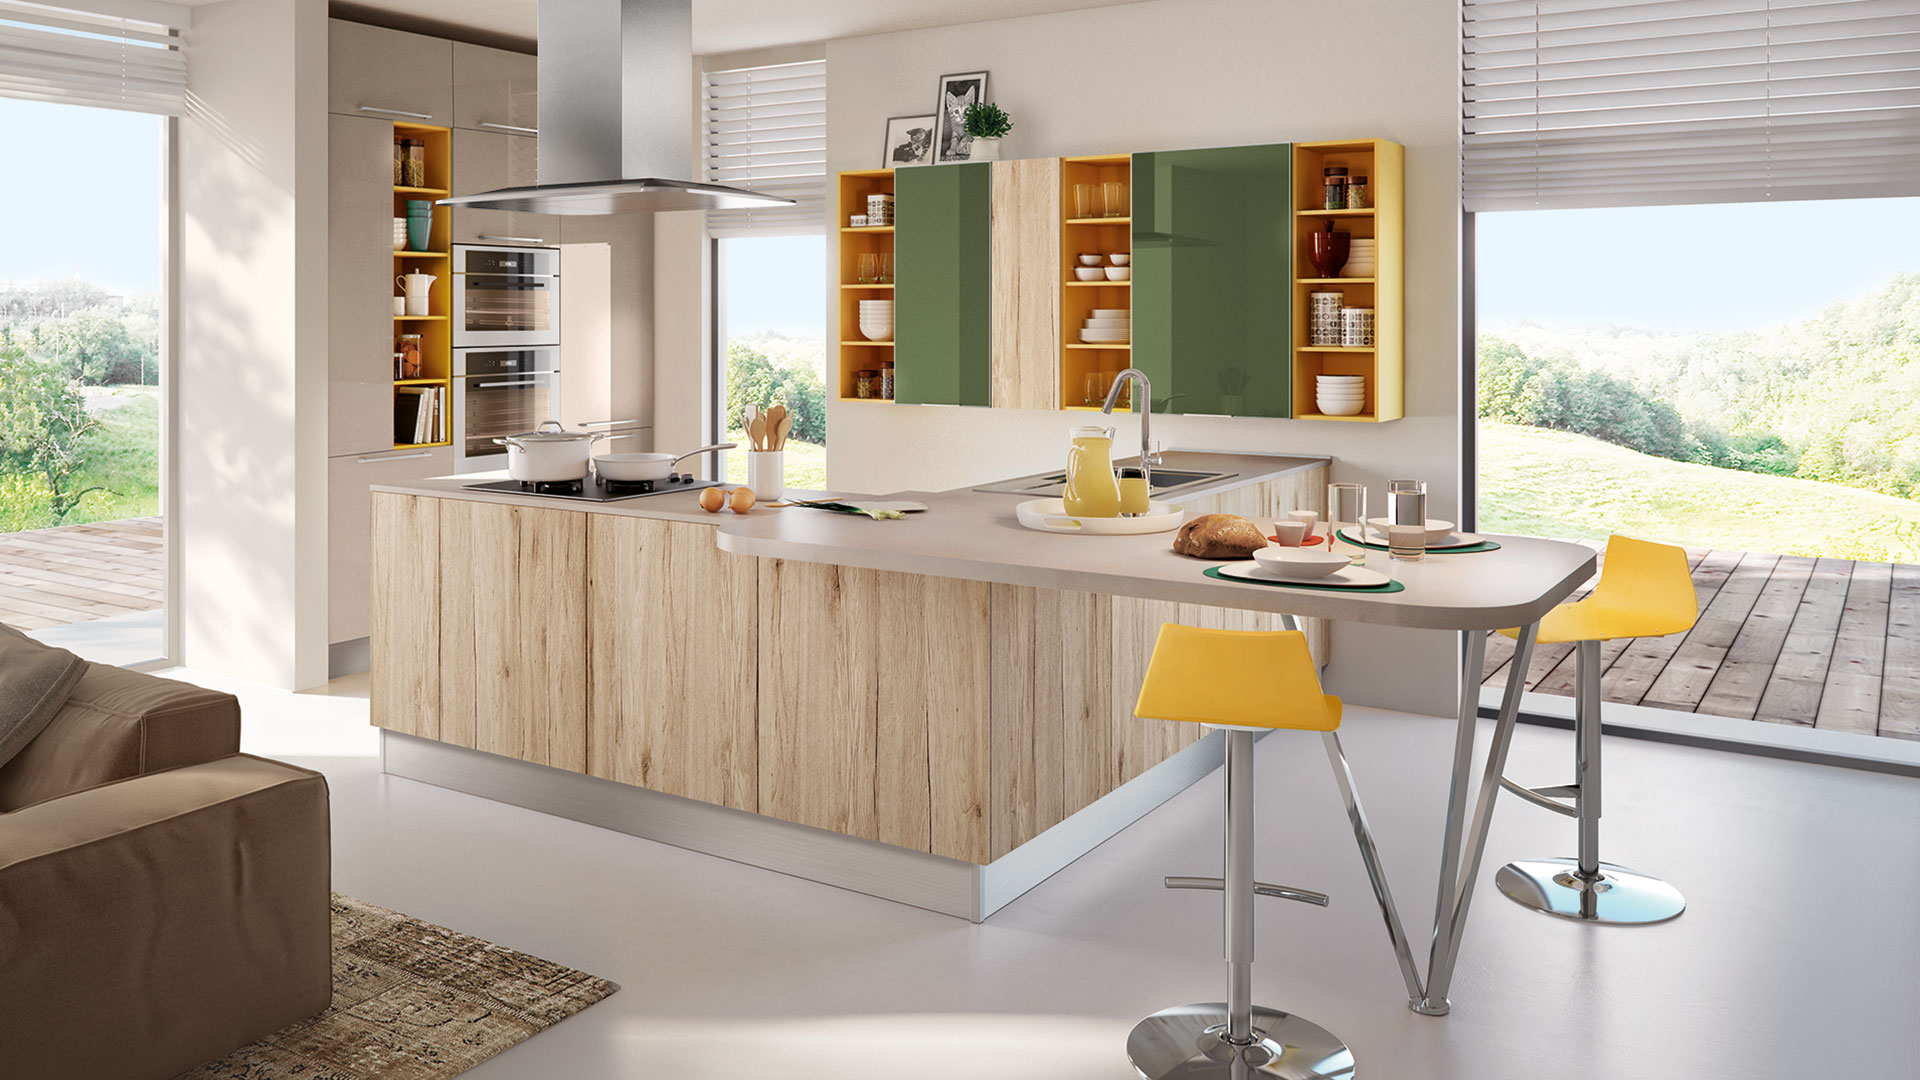 Costo Cucine Lube Moderne Prezzi.Swing Cucine Moderne Cucine Lube